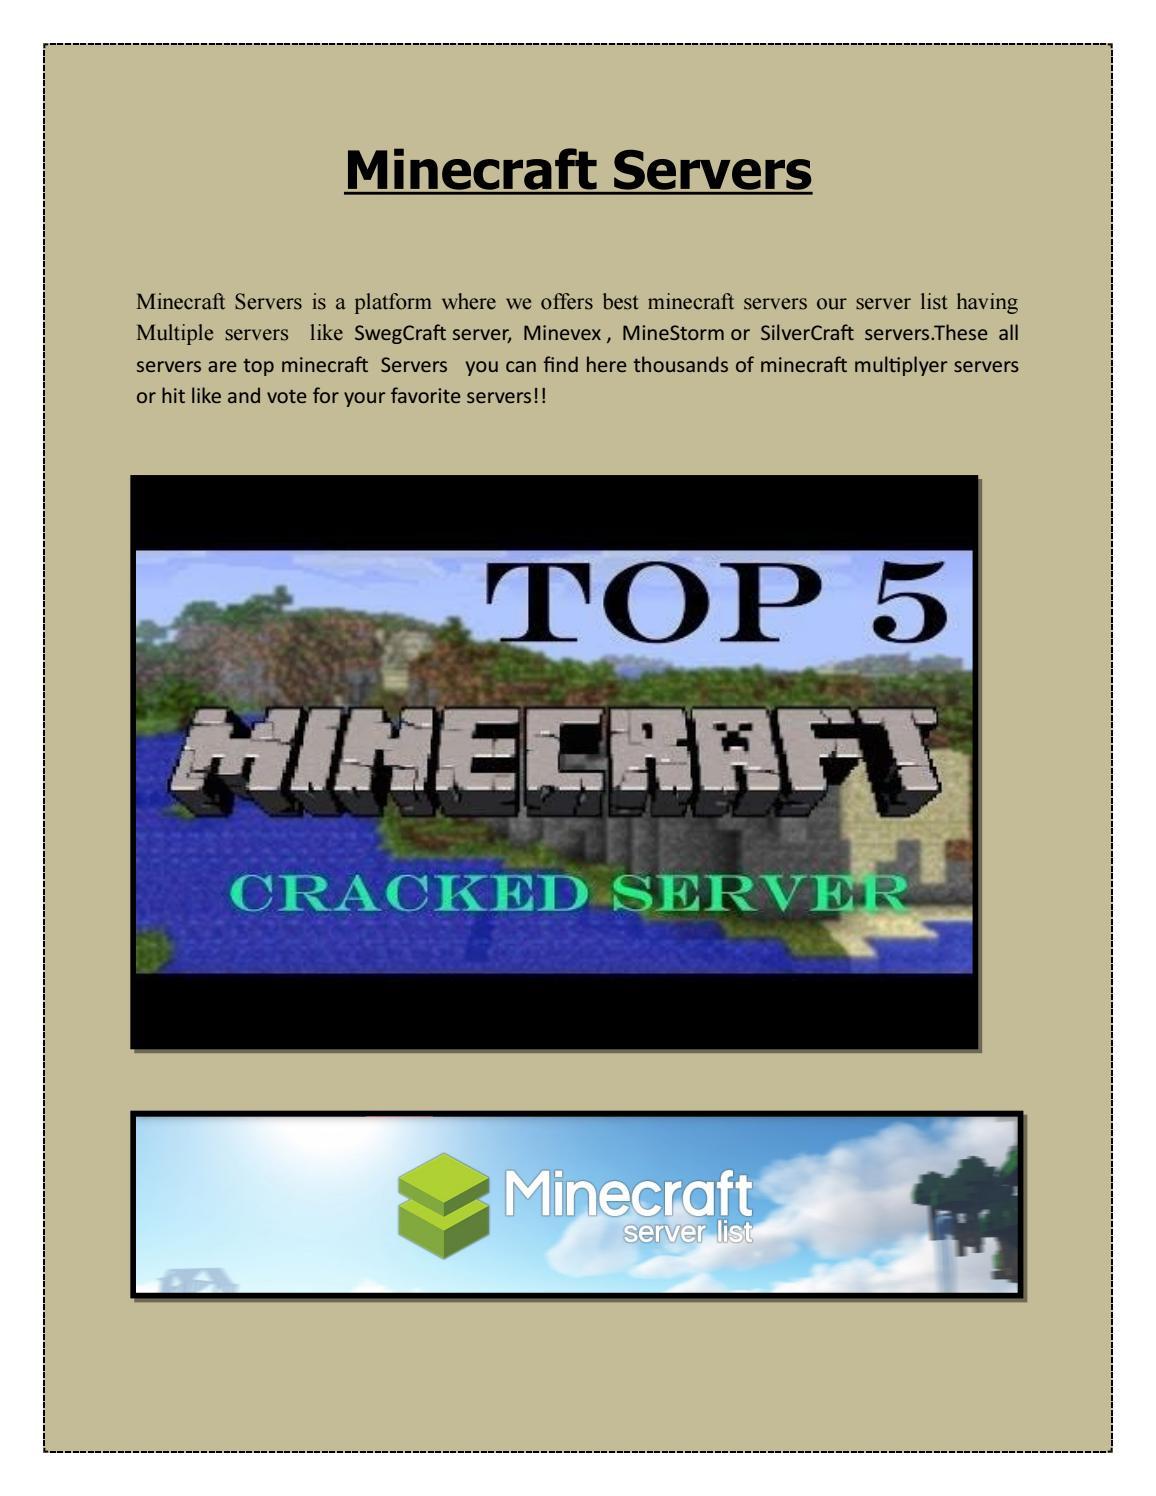 Minecraft Games Server by Minecarftservers - issuu